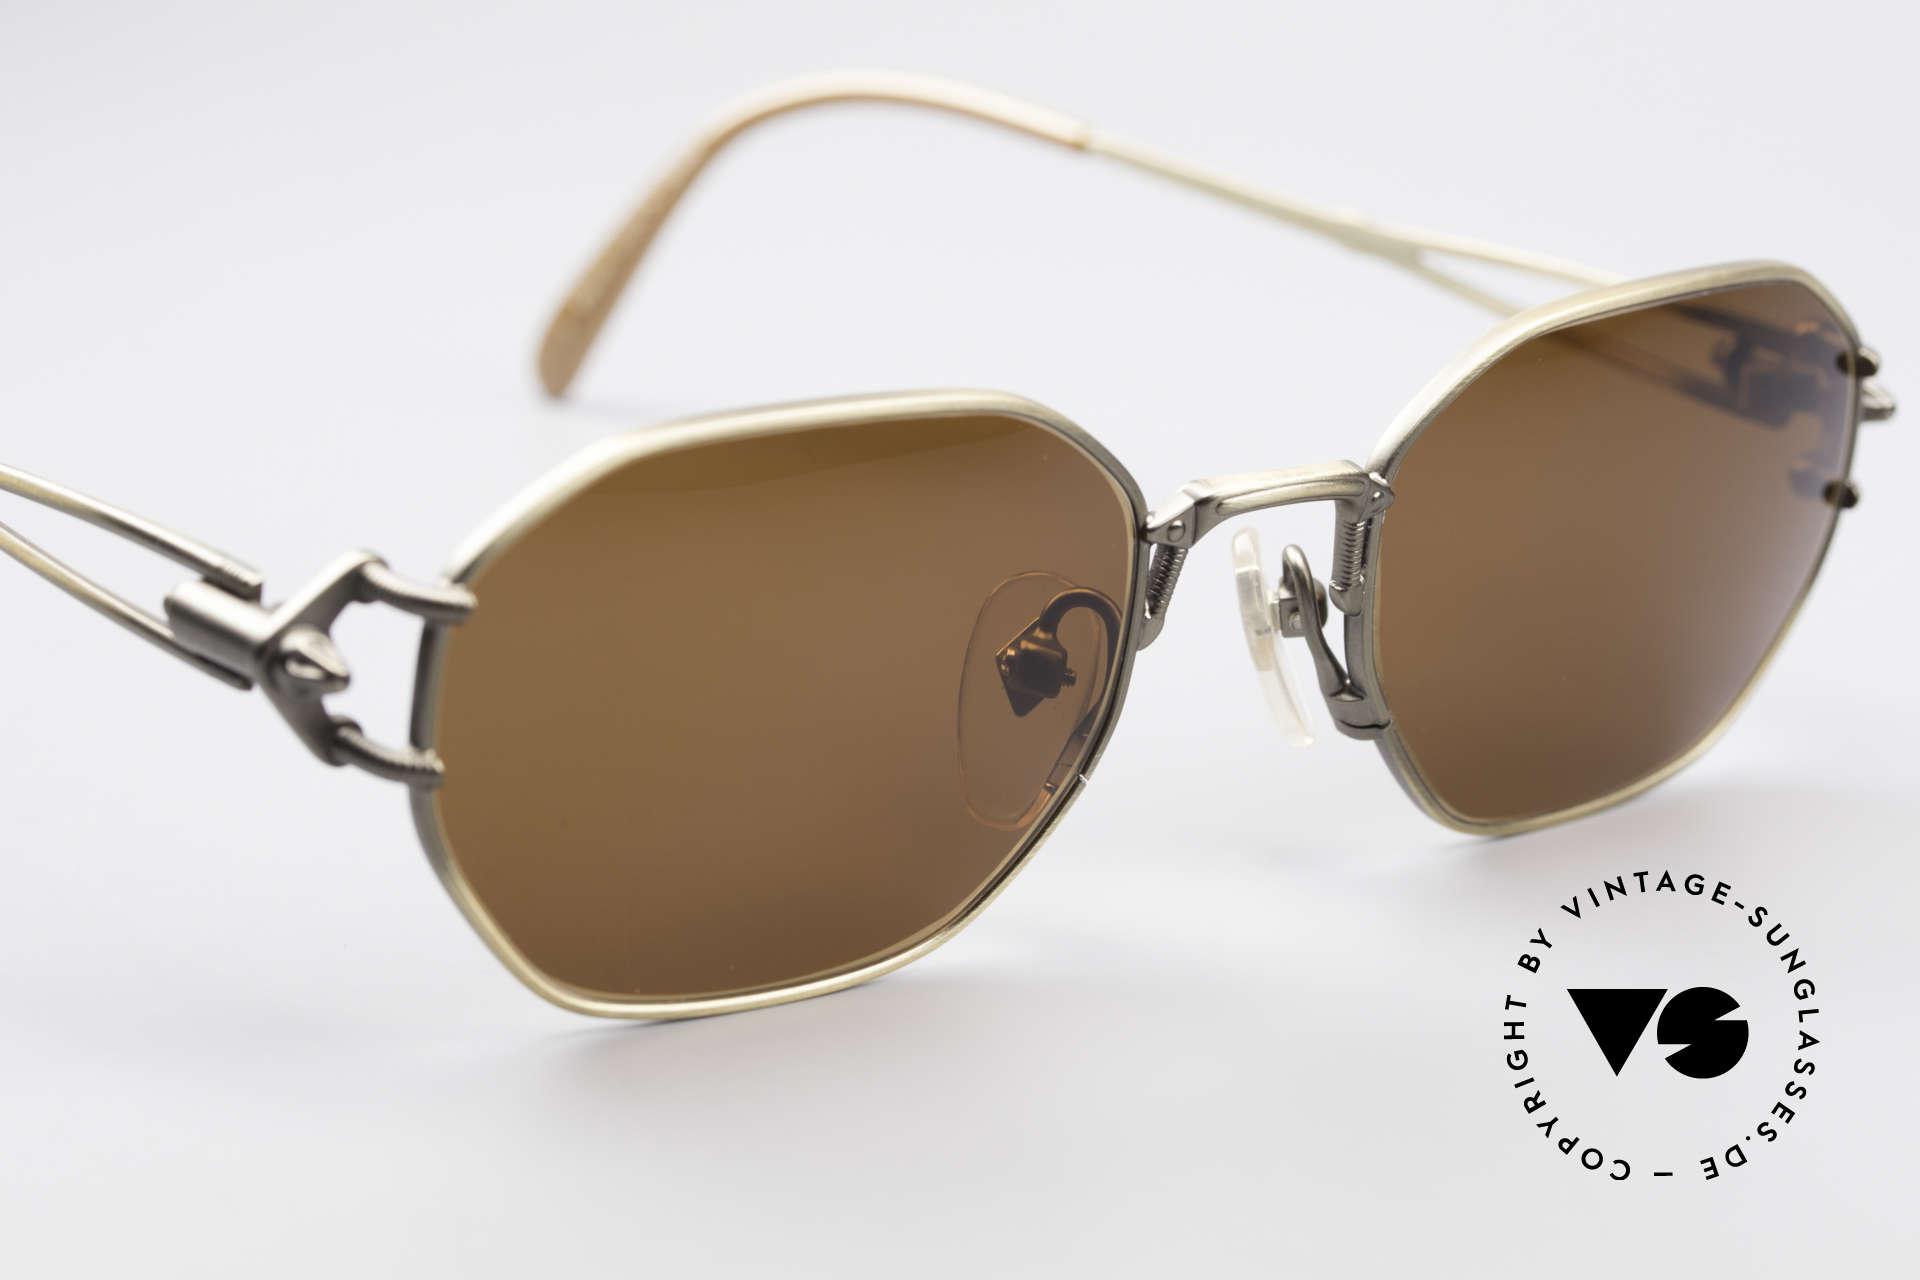 Jean Paul Gaultier 55-6106 90's Designer Sunglasses, unworn (like all our rare old 1990's designer sunglasses), Made for Men and Women